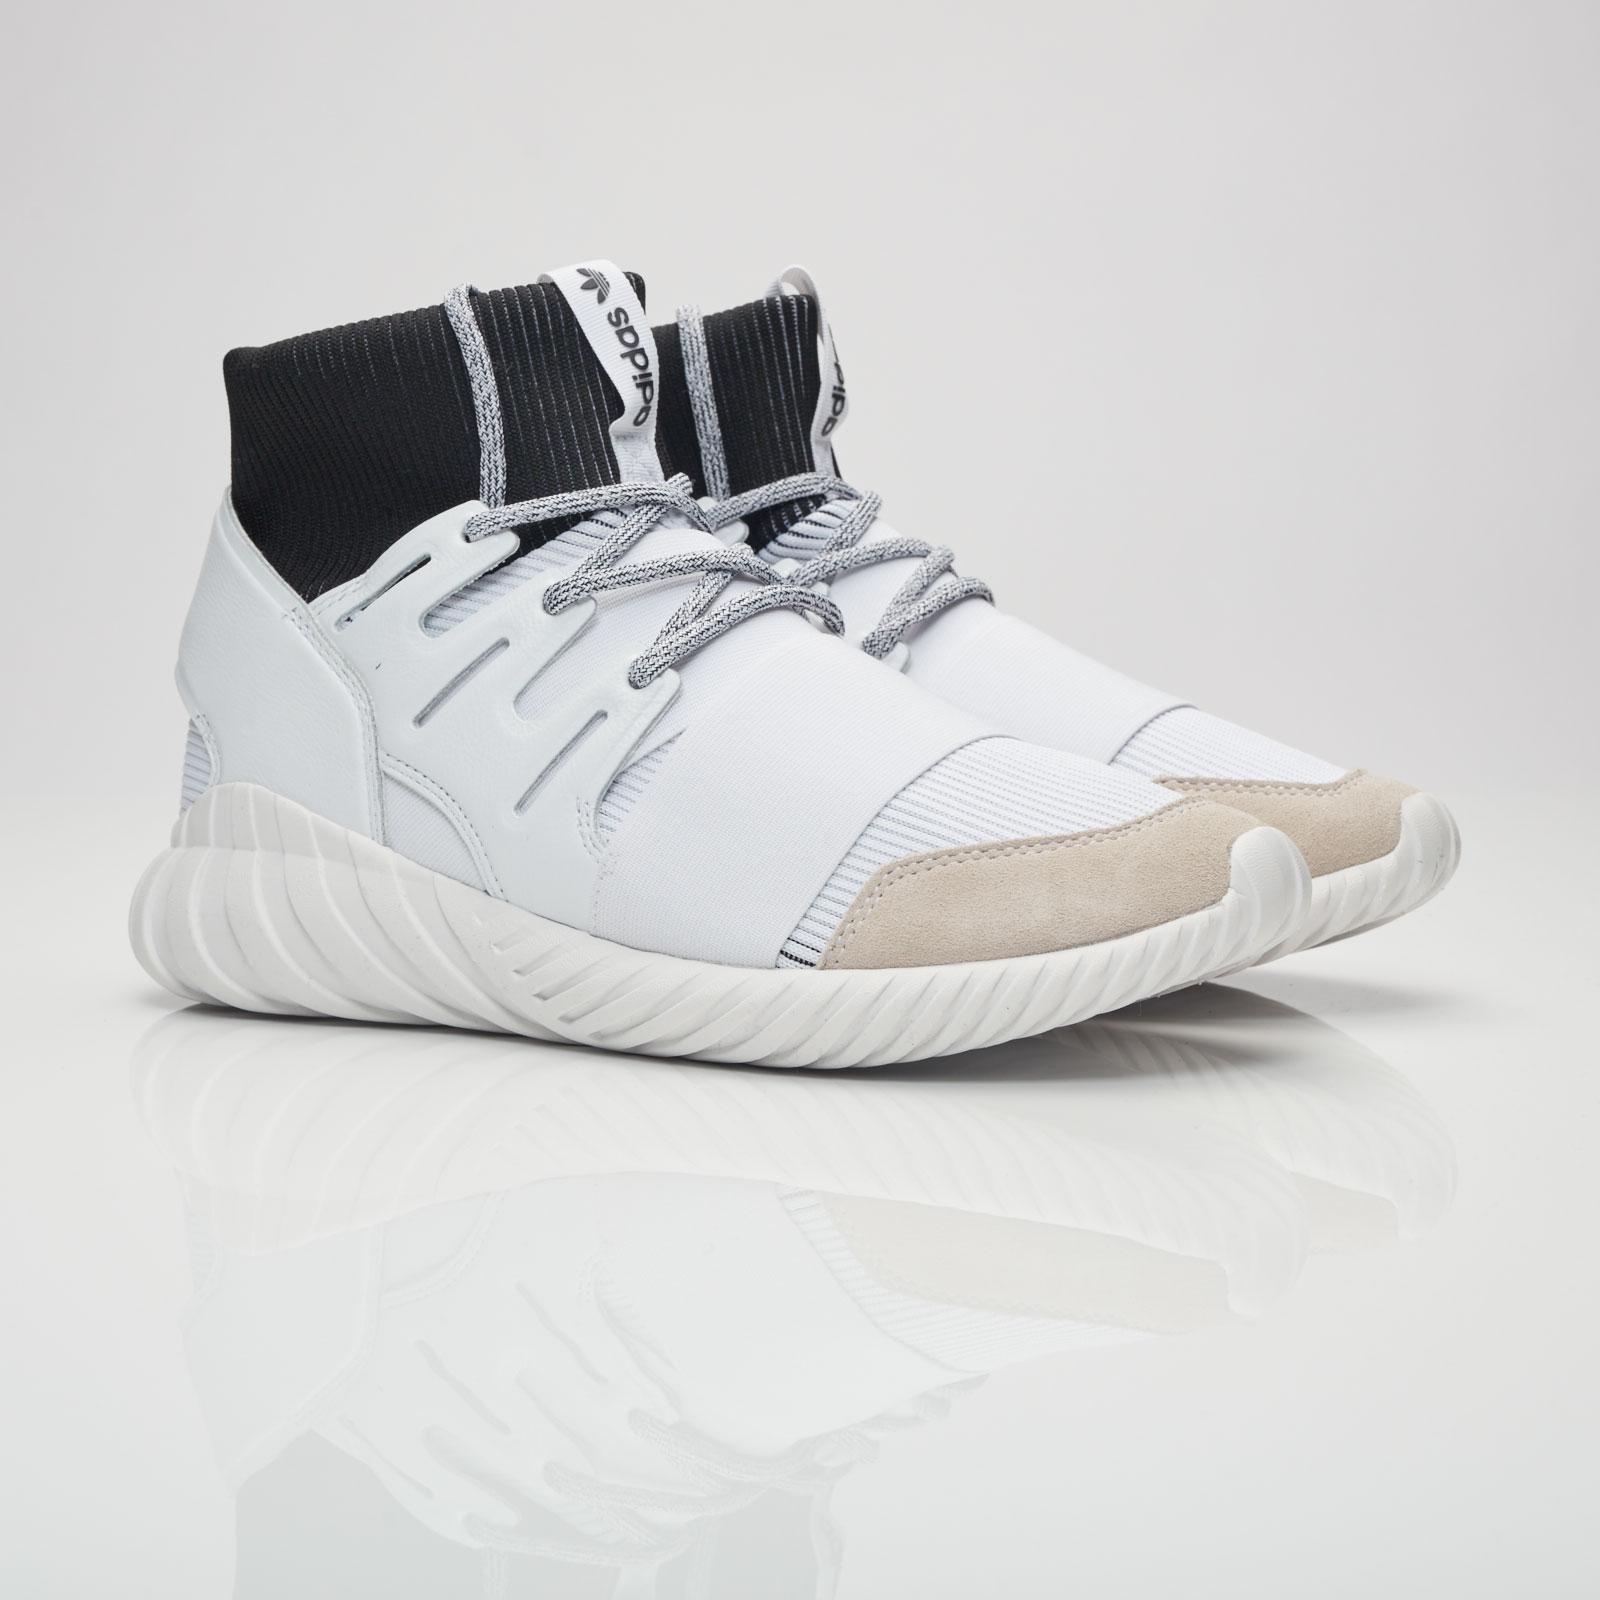 Ba7554 scarpe da ginnasticanstuff scarpe adidas tubulare doom